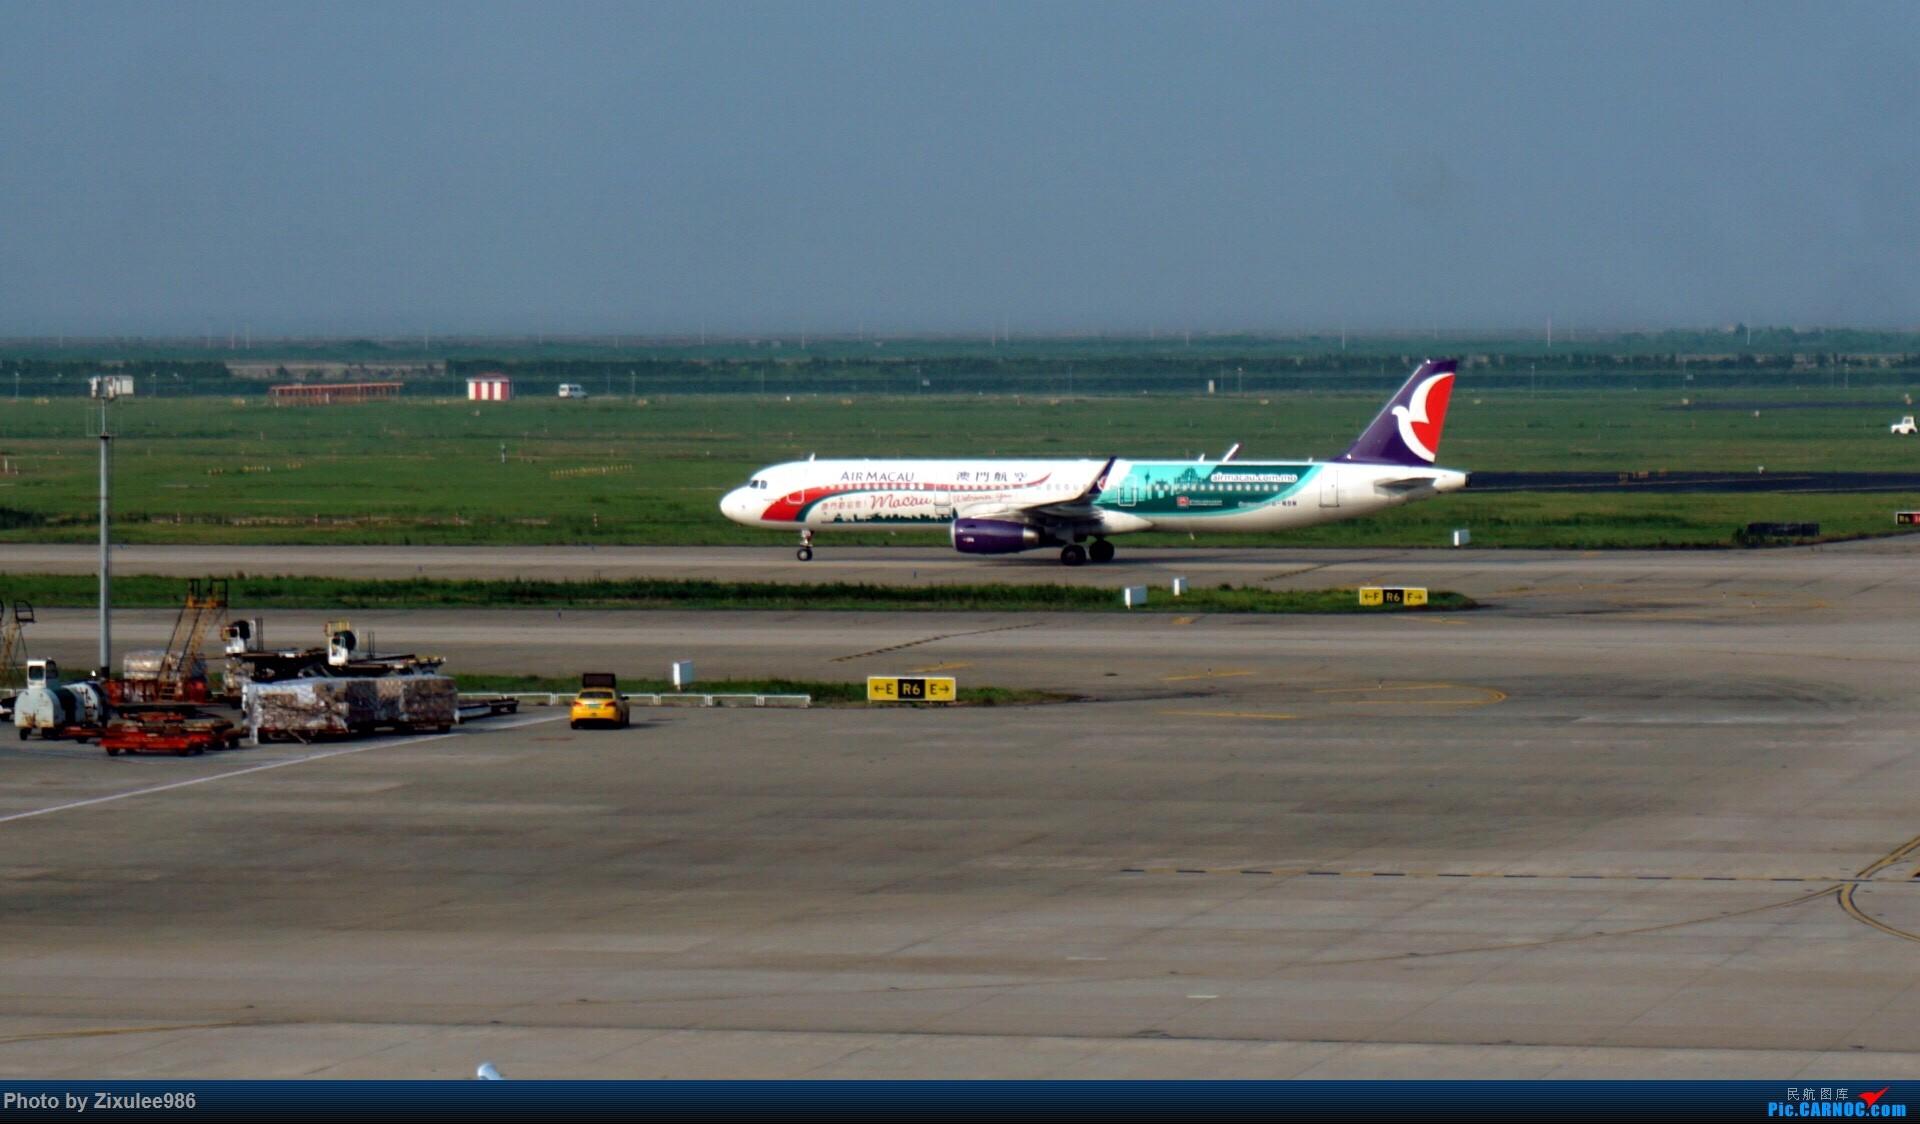 Re:[原创]加拿大21日游学之旅(一)~JJN-PVG-YYZ..(内含flightlog)~第一次发游记~多图缓更请谅解 AIRBUS A321-200 B-MBM 中国上海浦东国际机场